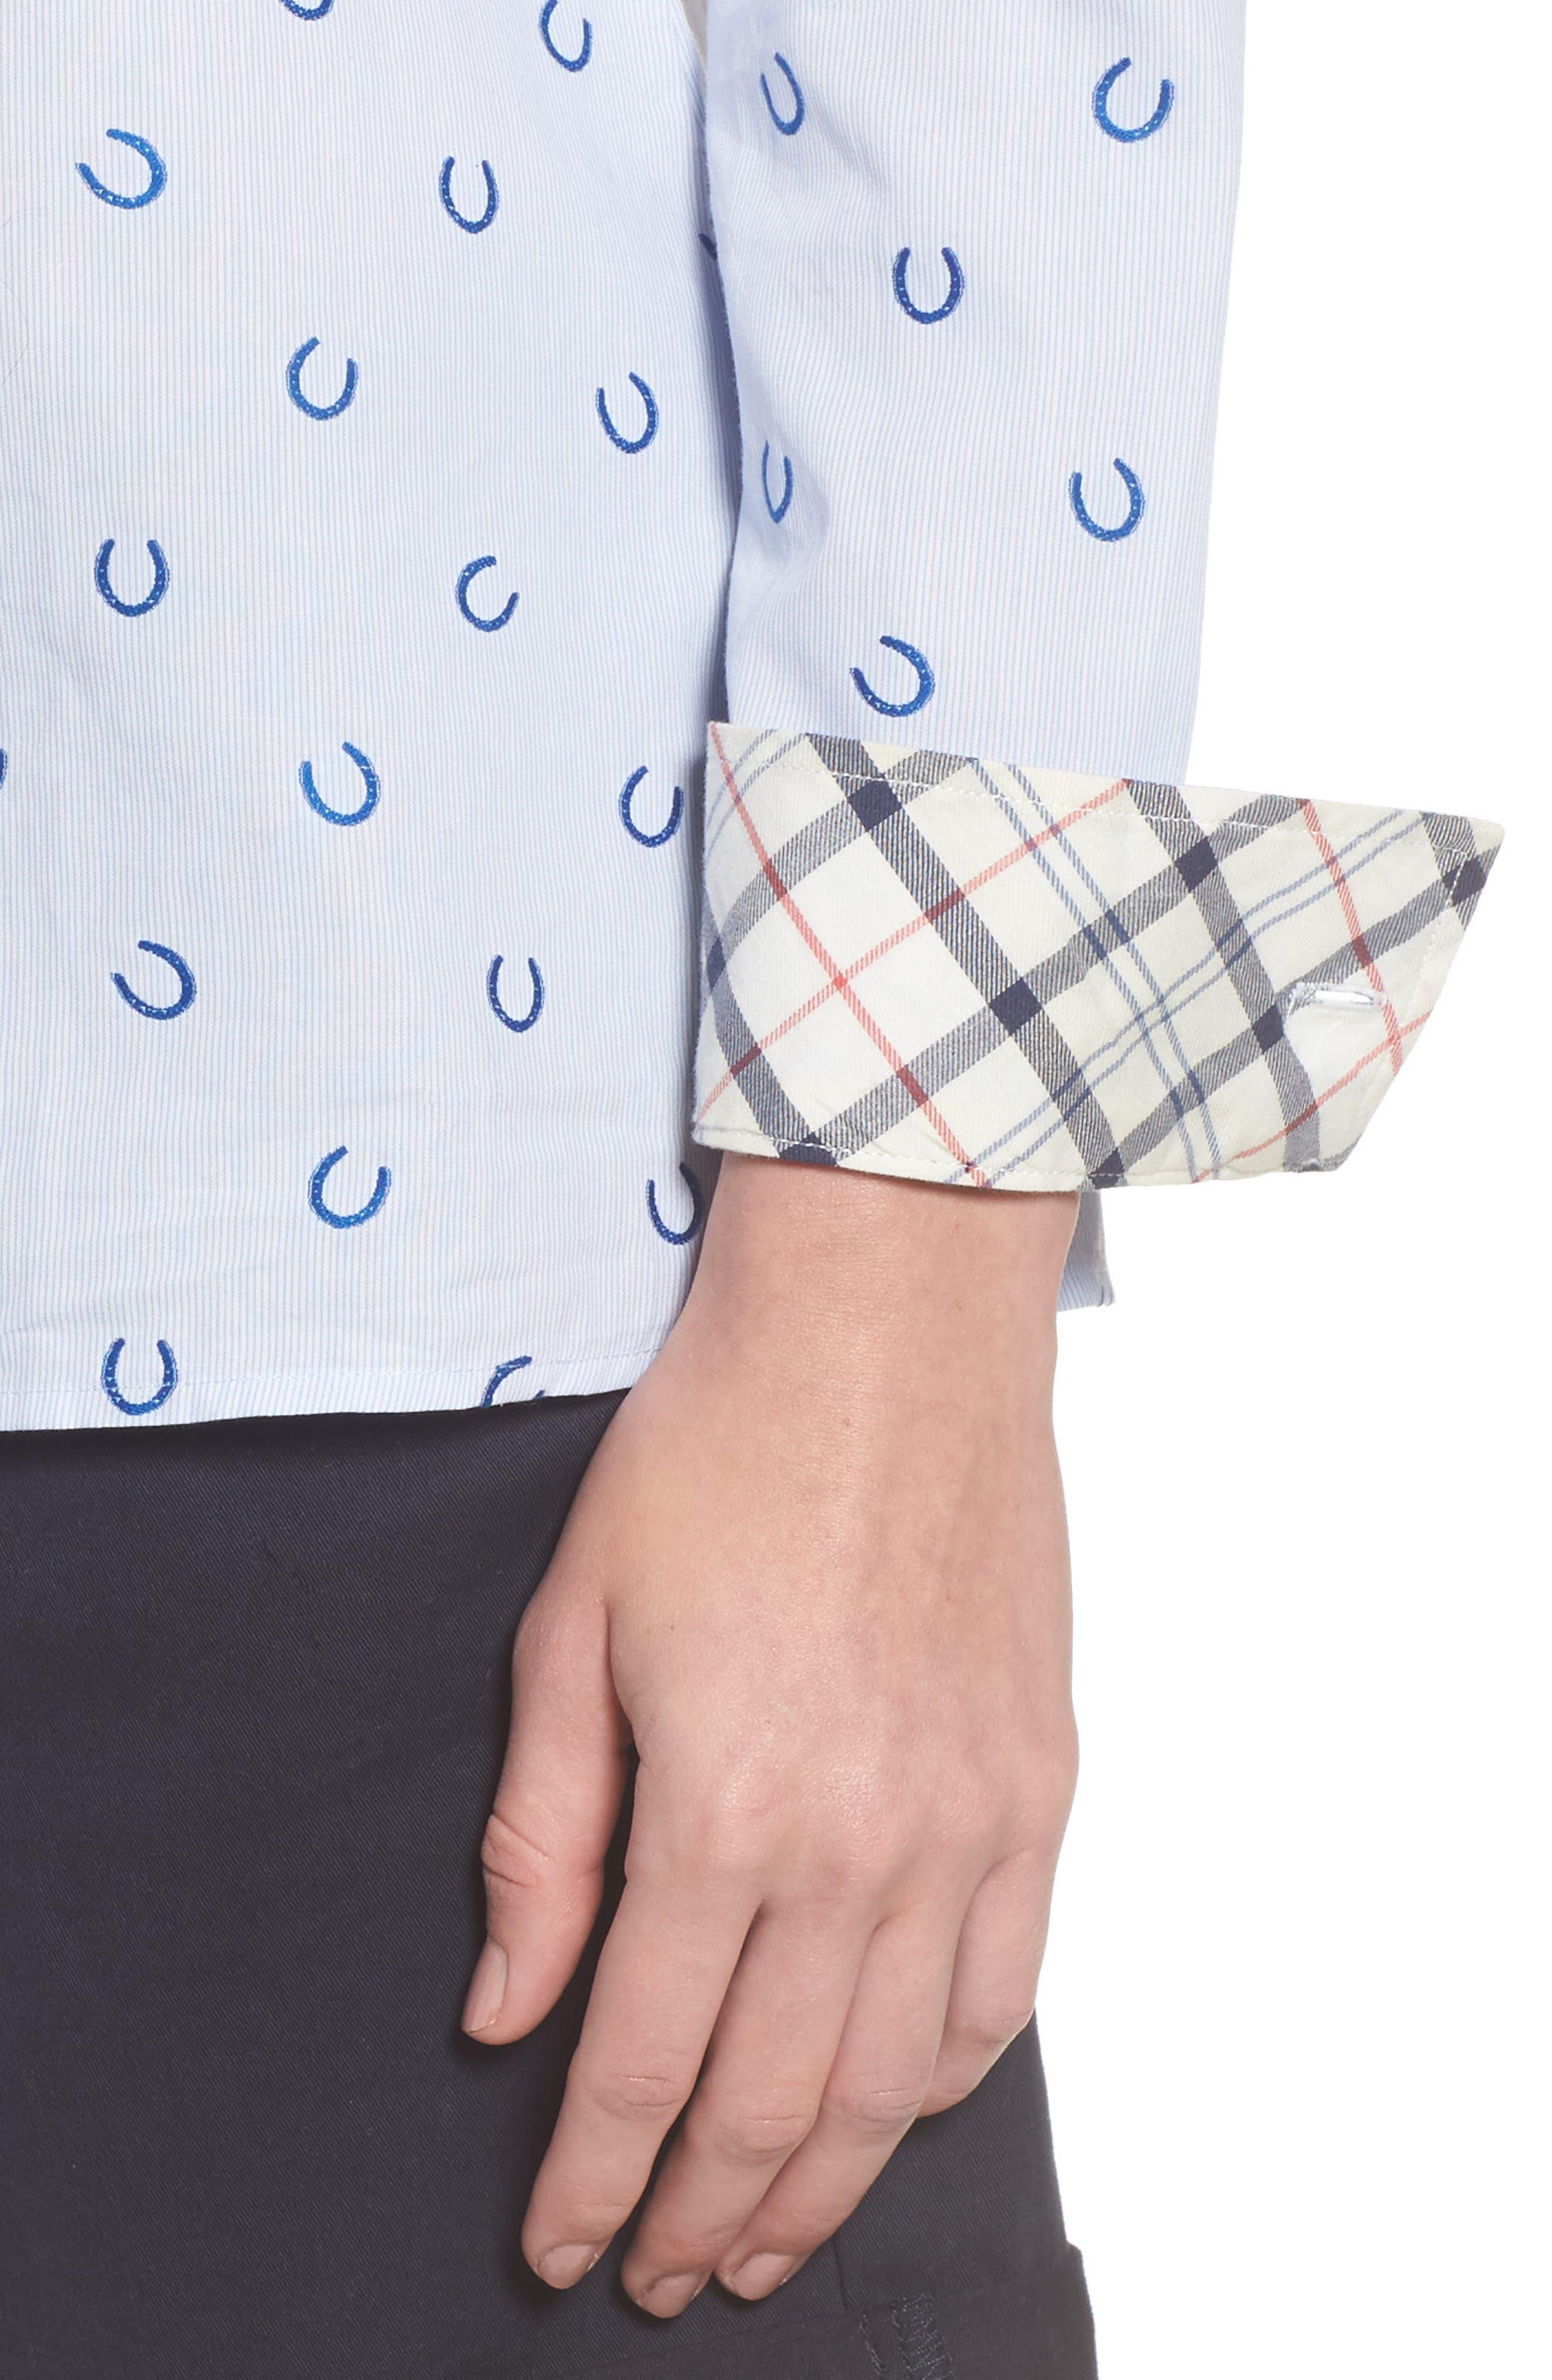 Daisyhill Regular Fit Shirt,                             Alternate thumbnail 4, color,                             Pale Blue